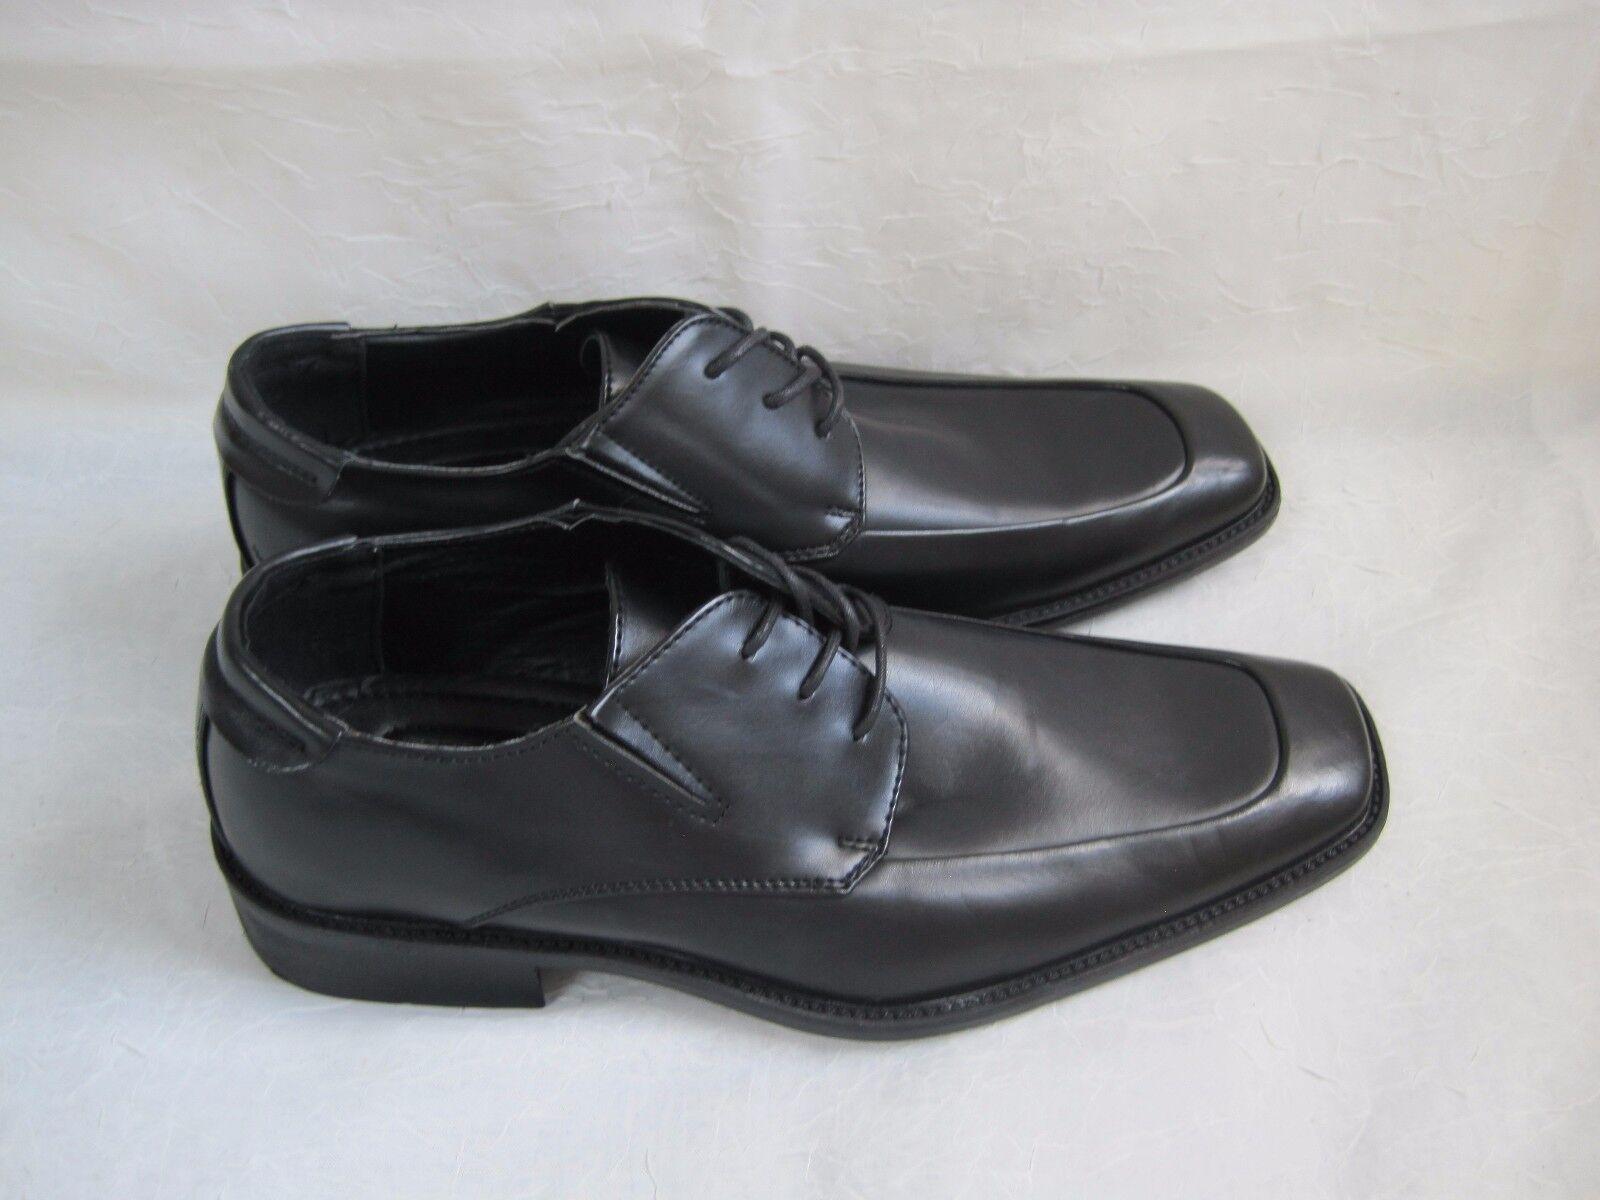 New! Klik Mens SM New York Klik New! Dress Shoes Style 66283 Size 8 Black  20F fca0b5